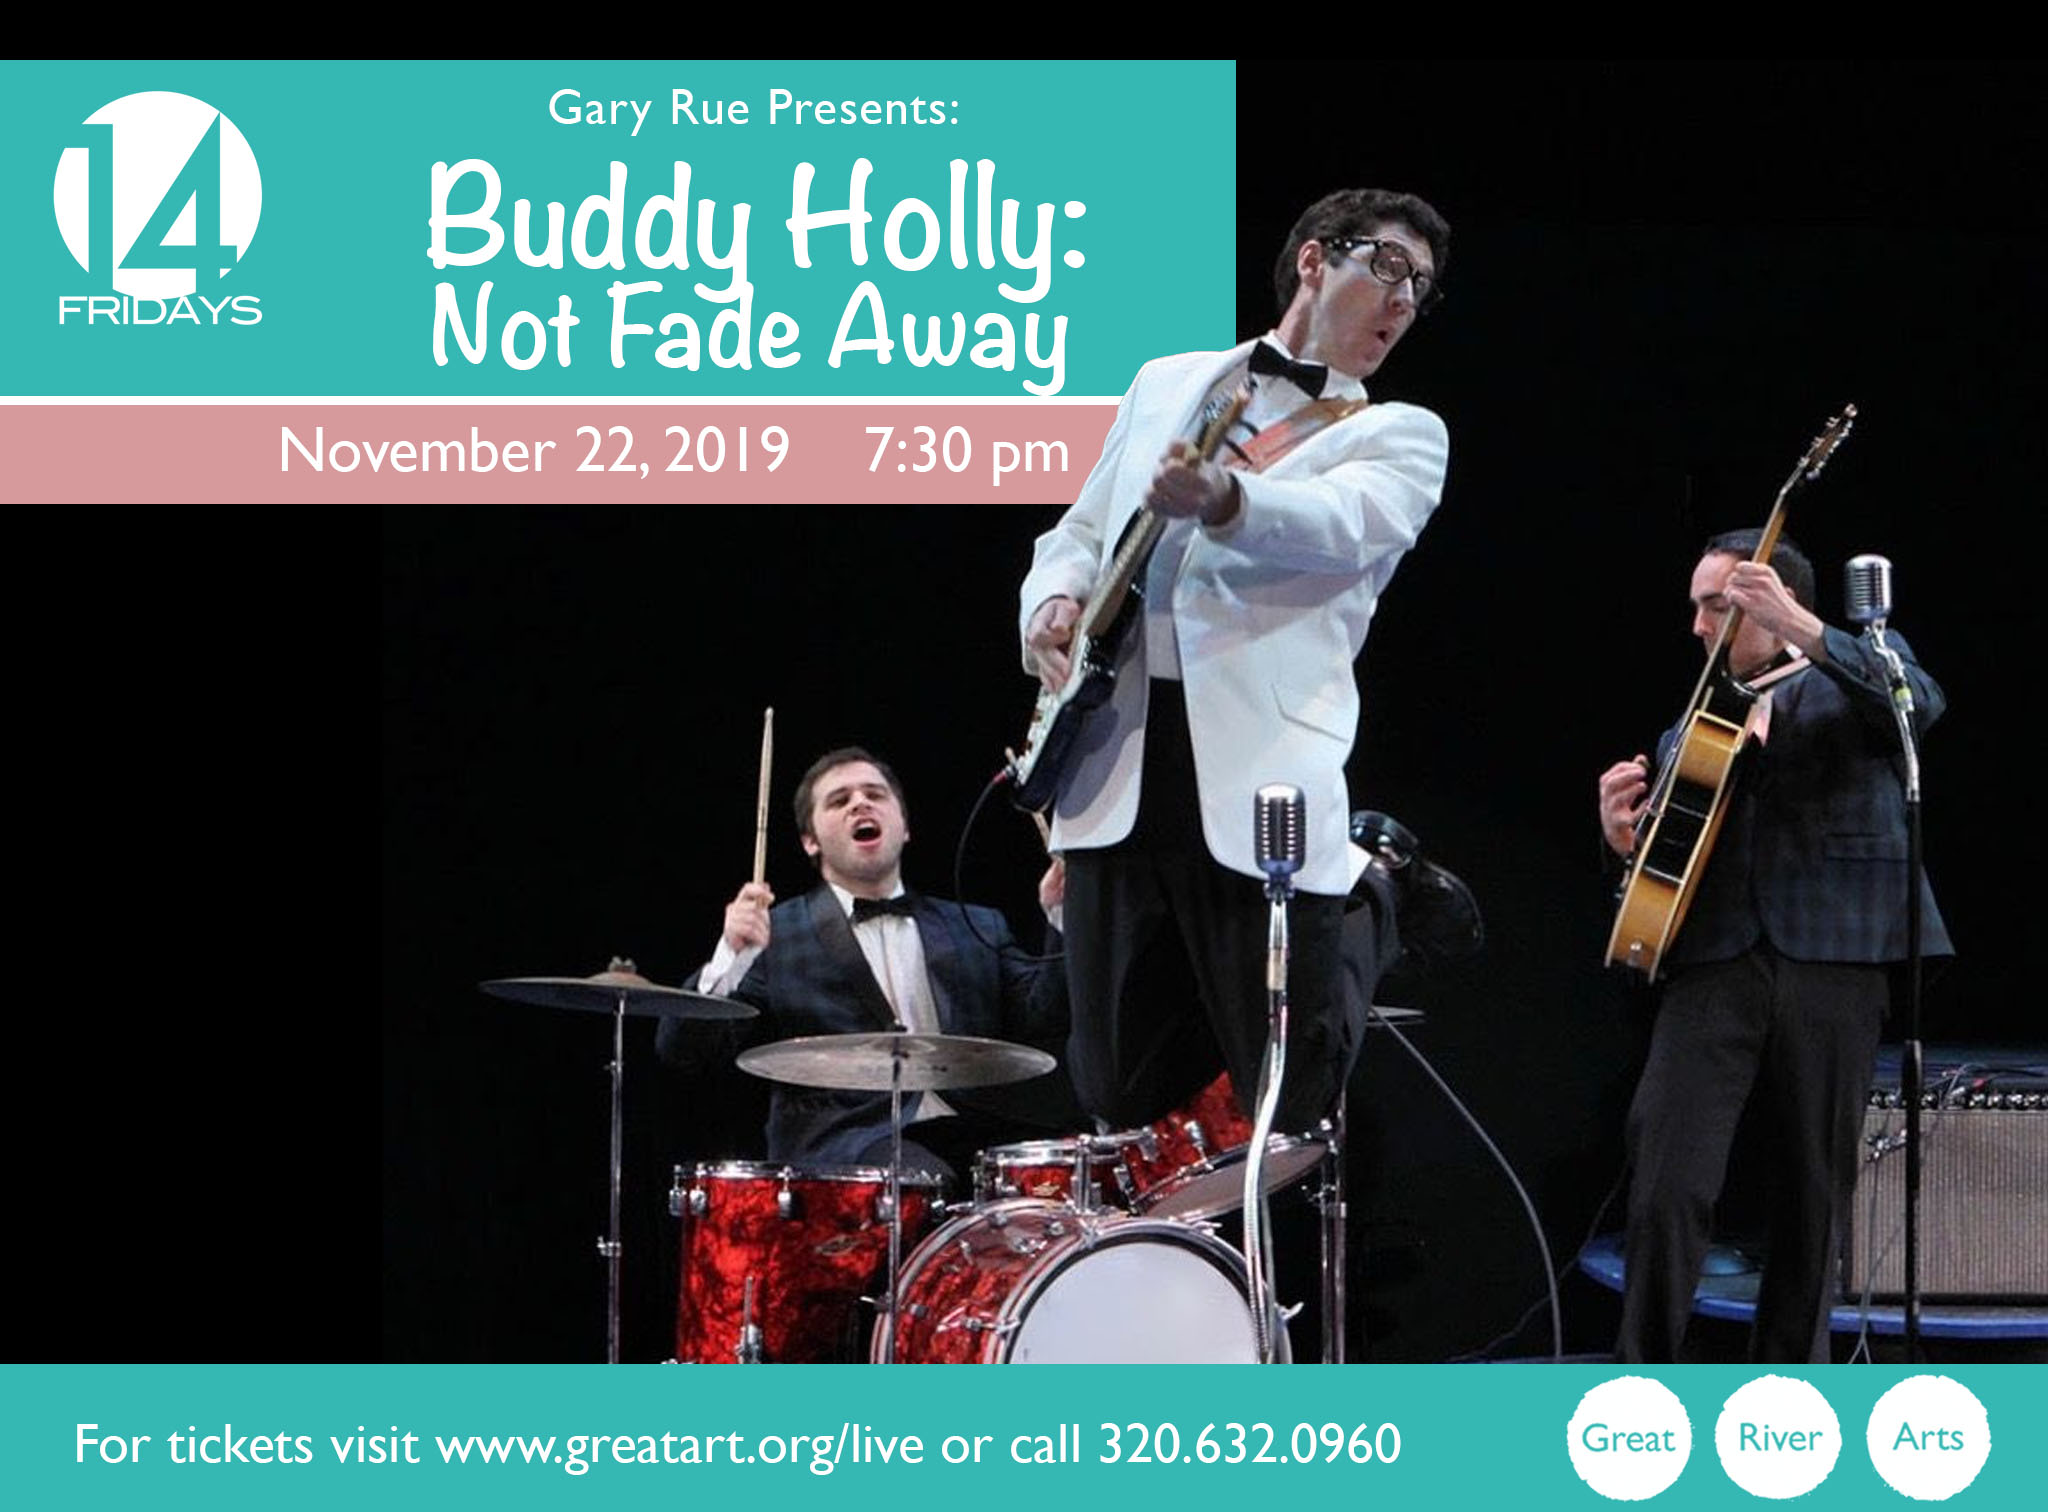 BoddyHolly-banner.jpg